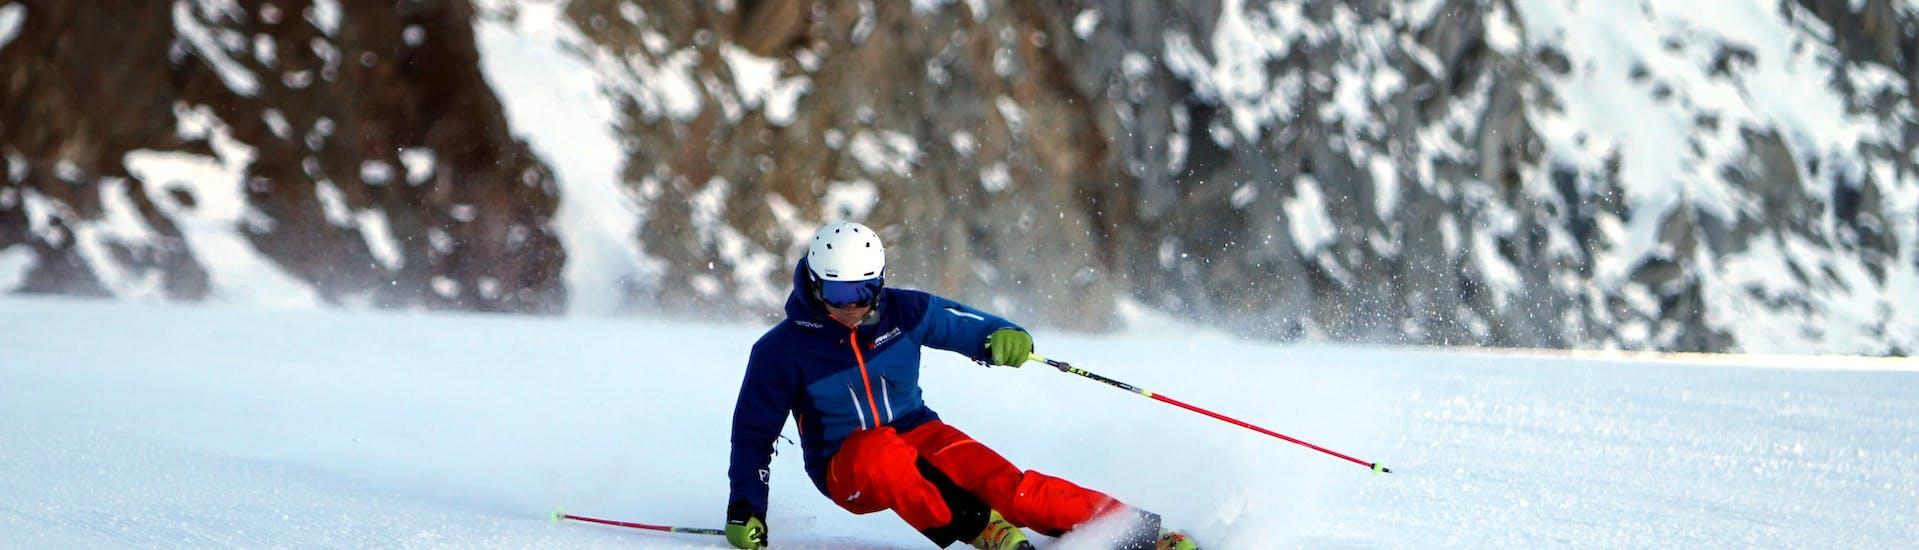 A ski instructor is mastering a slope in Sölden during a Private Ski Lessons for Adults at Obergurgl-Hochgurgl organized by the ski school Ski- und Snowboardschule SNOWLINES Sölden in the ski resort of Sölden.